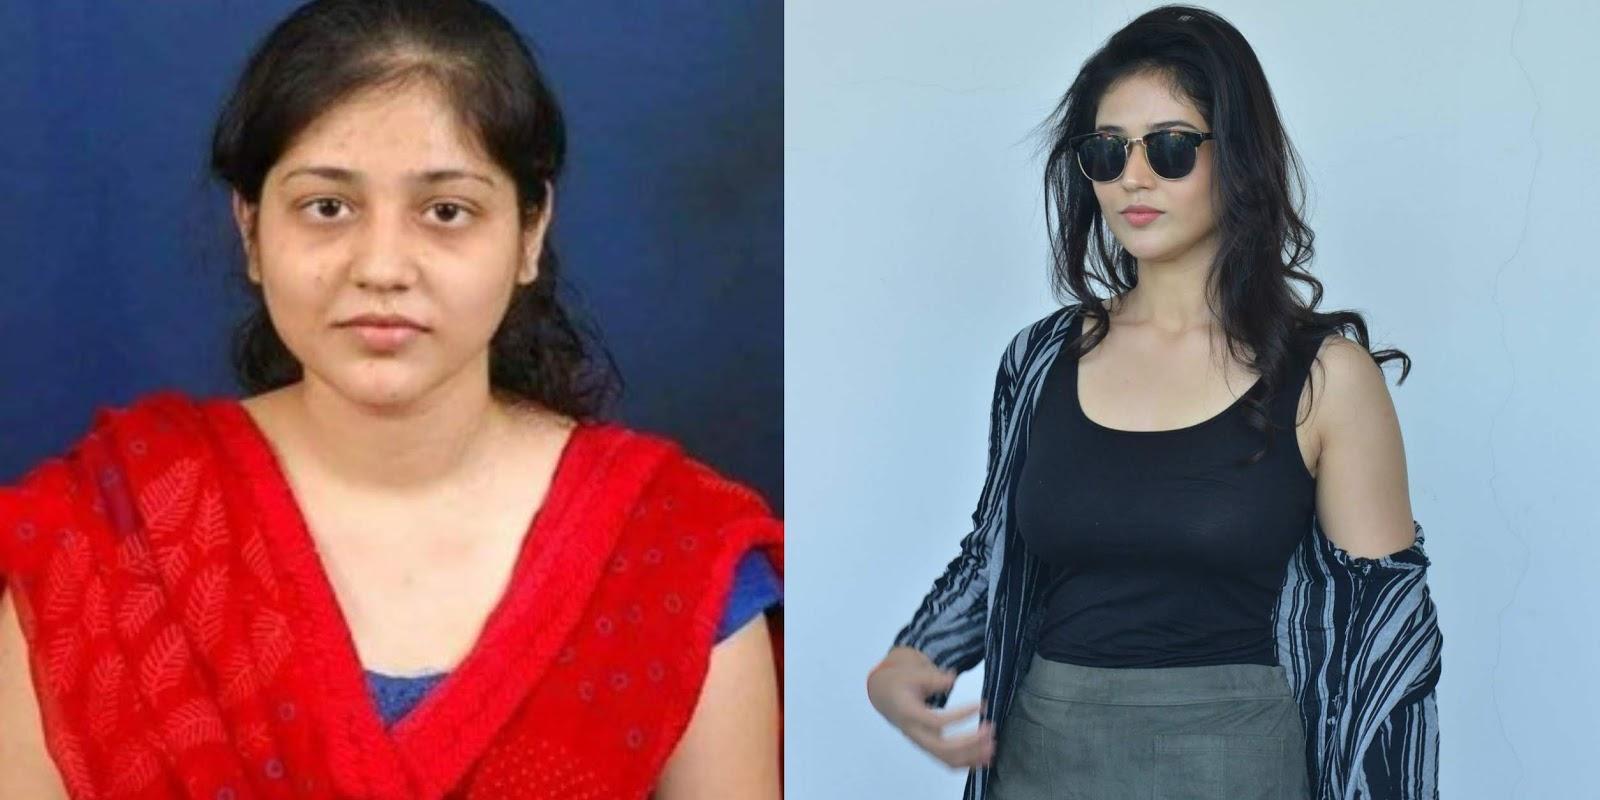 Priyanka Jawalkar's Epic Reply To The Trolls On Her Old Chubby Photo!